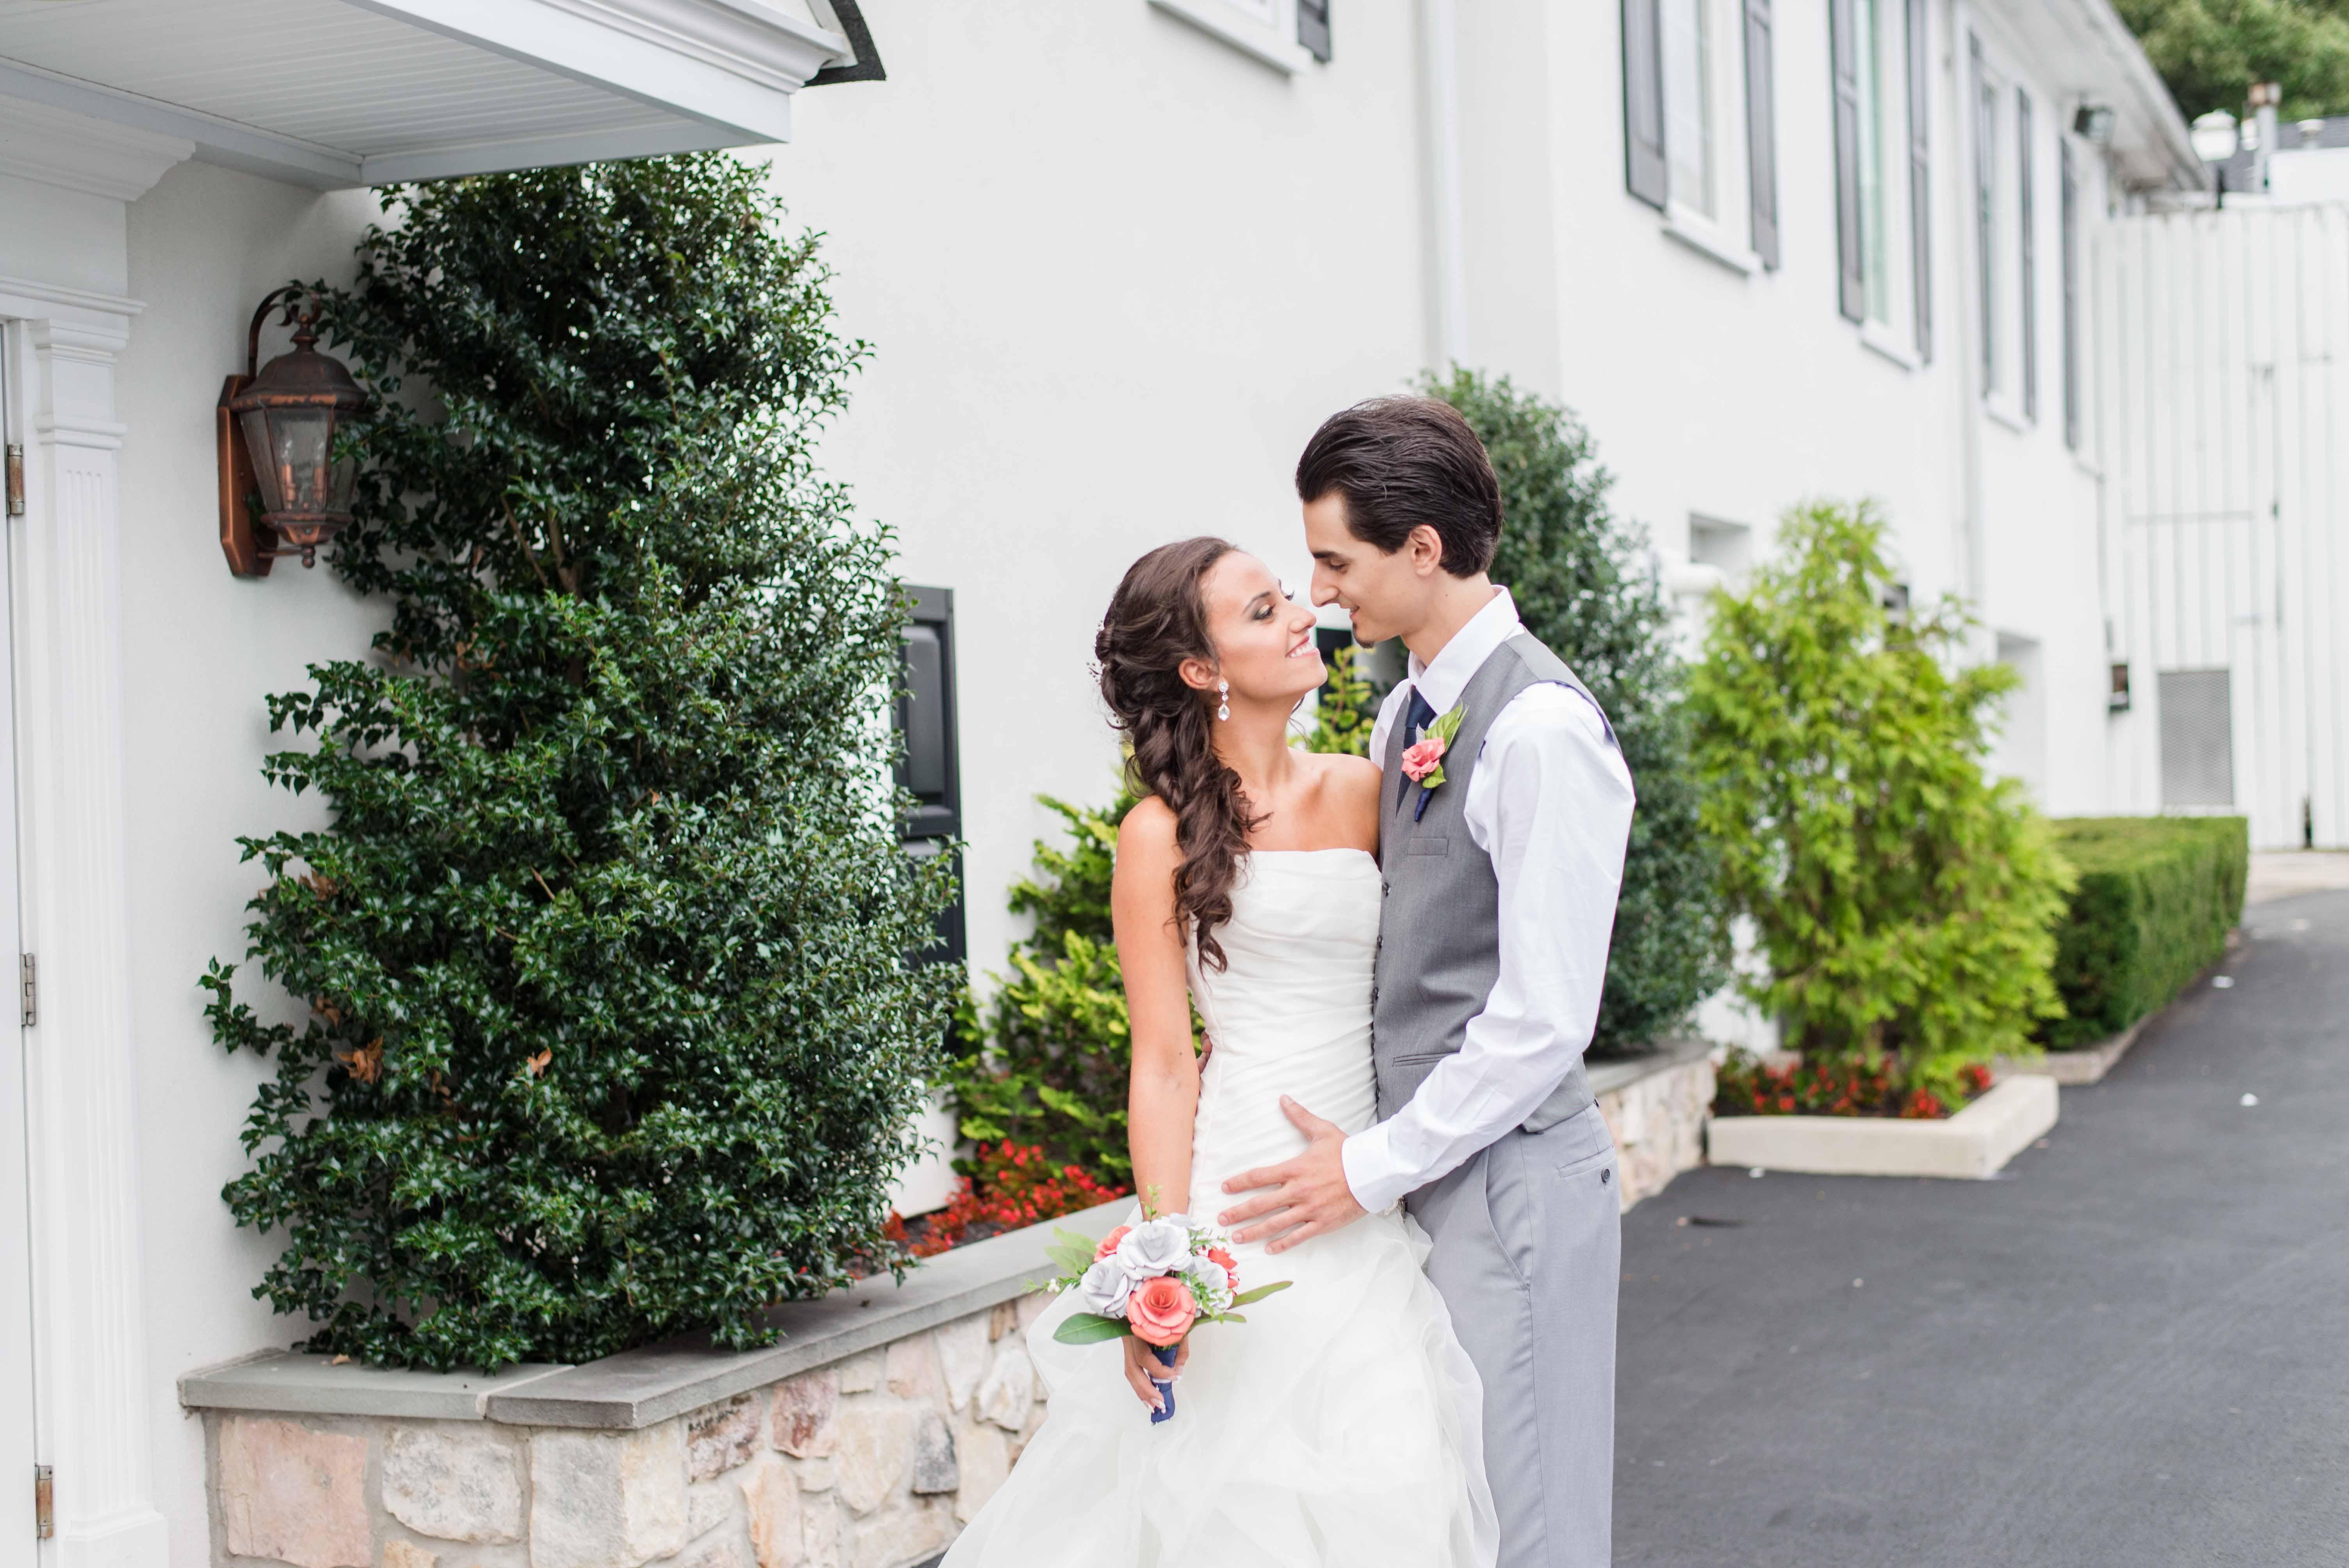 Portraits - Bruno Wedding William Penn Inn Andrea Krout Photography